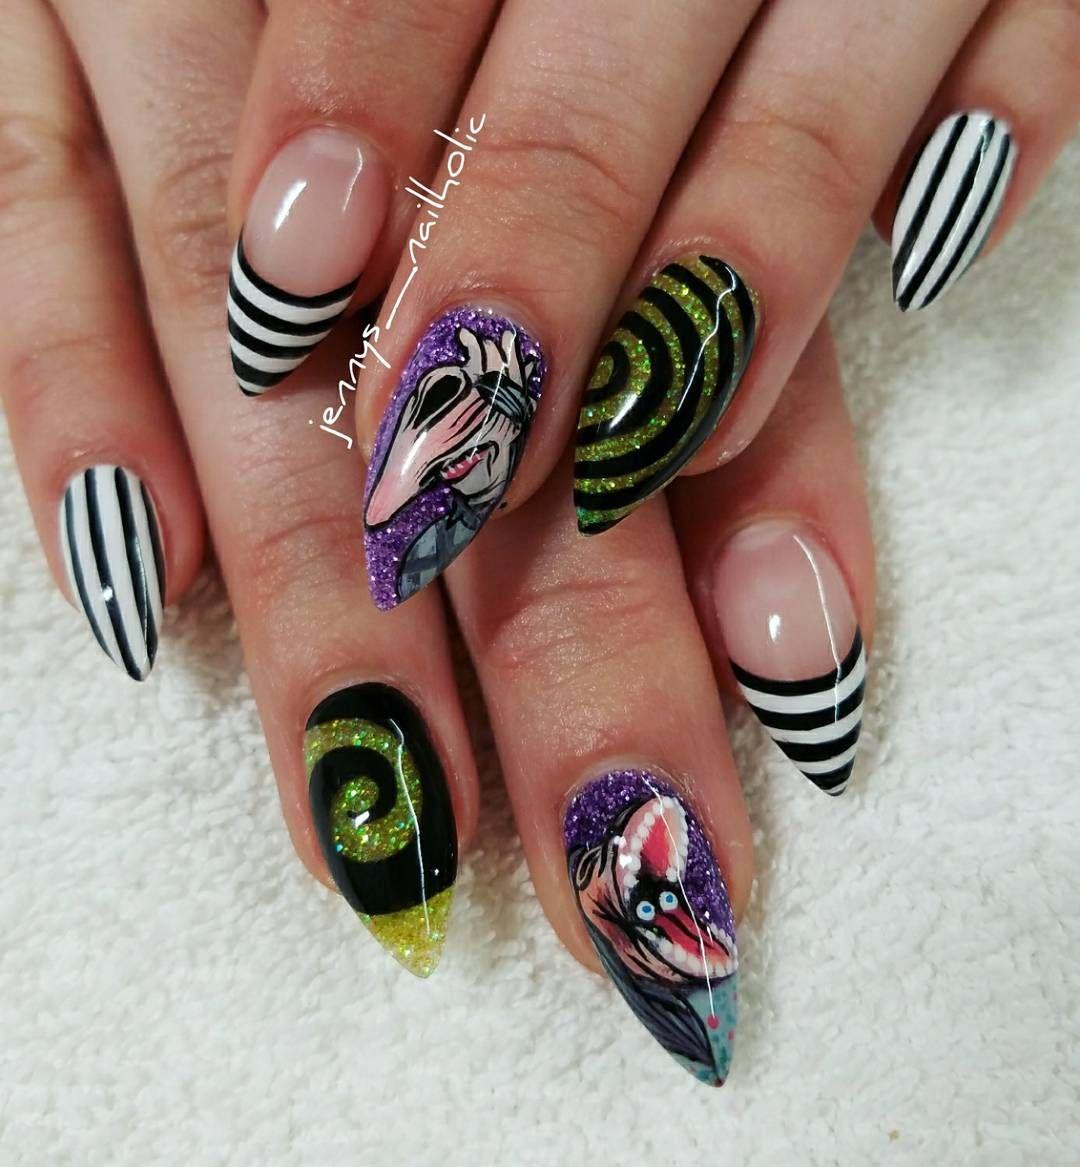 13 Ghostly Beetlejuice Nail Art Designs - Nails Magazine | uñas más ...